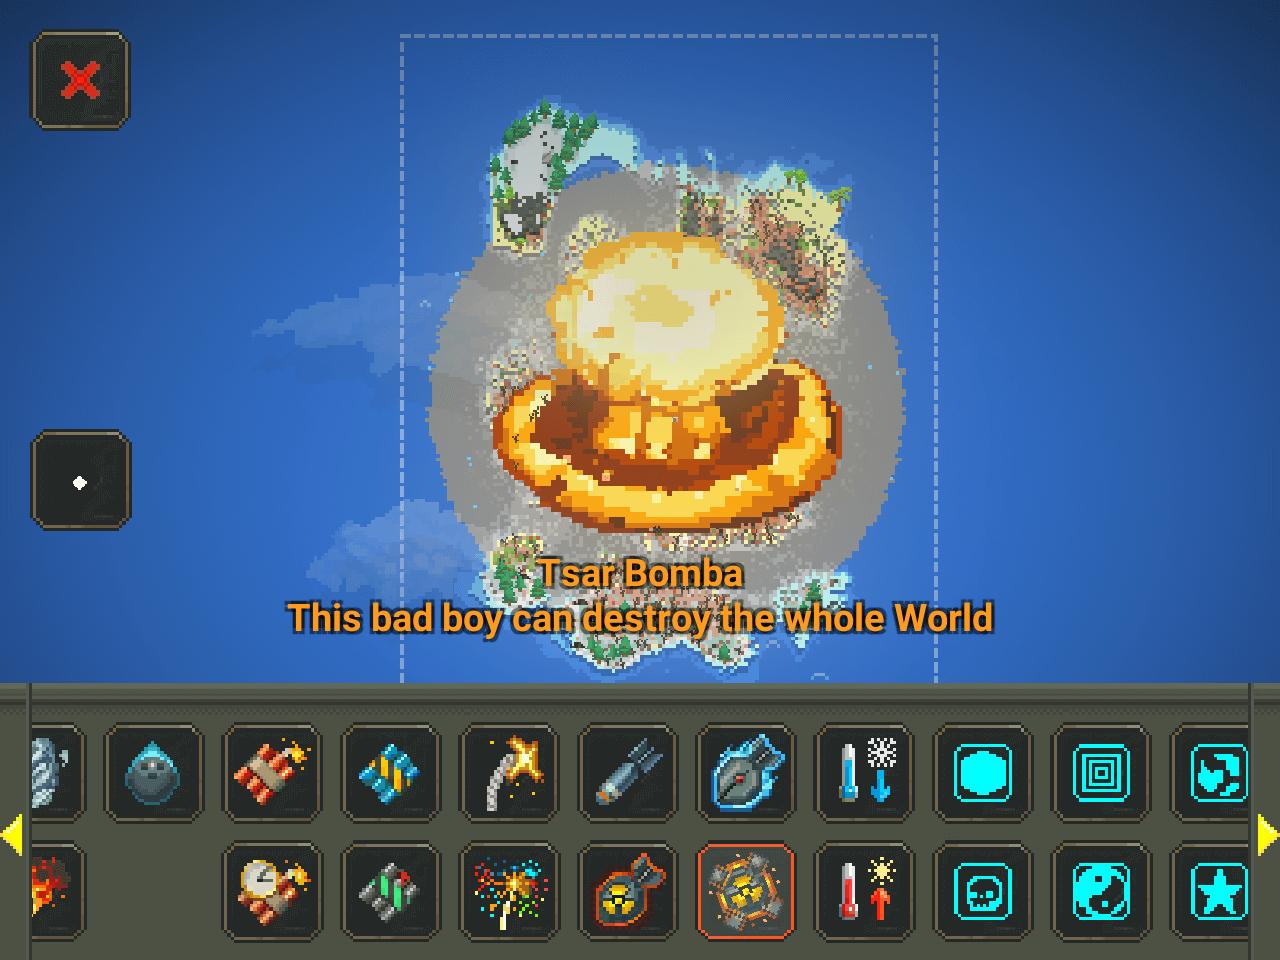 https://www.superworldbox.com/img/screenshots/011.png